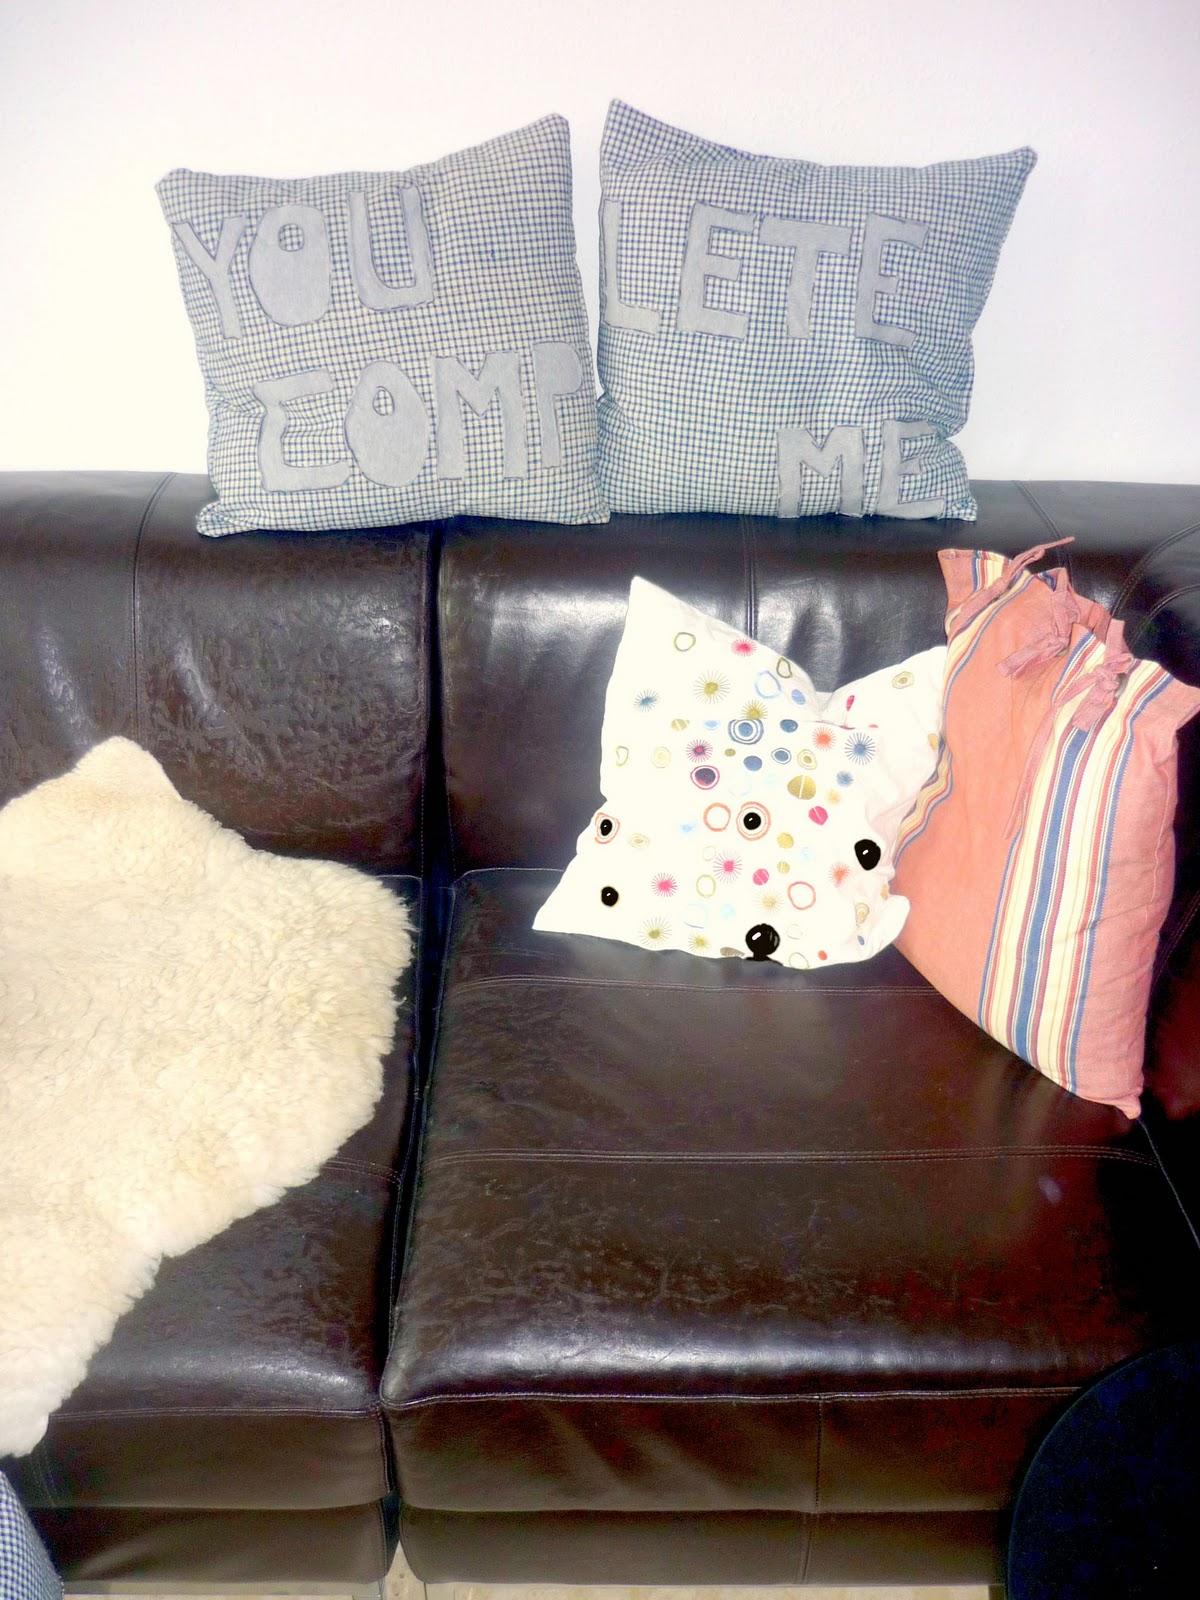 embrace the hedgehog projekt 19 woche 21 buchstabensalat. Black Bedroom Furniture Sets. Home Design Ideas